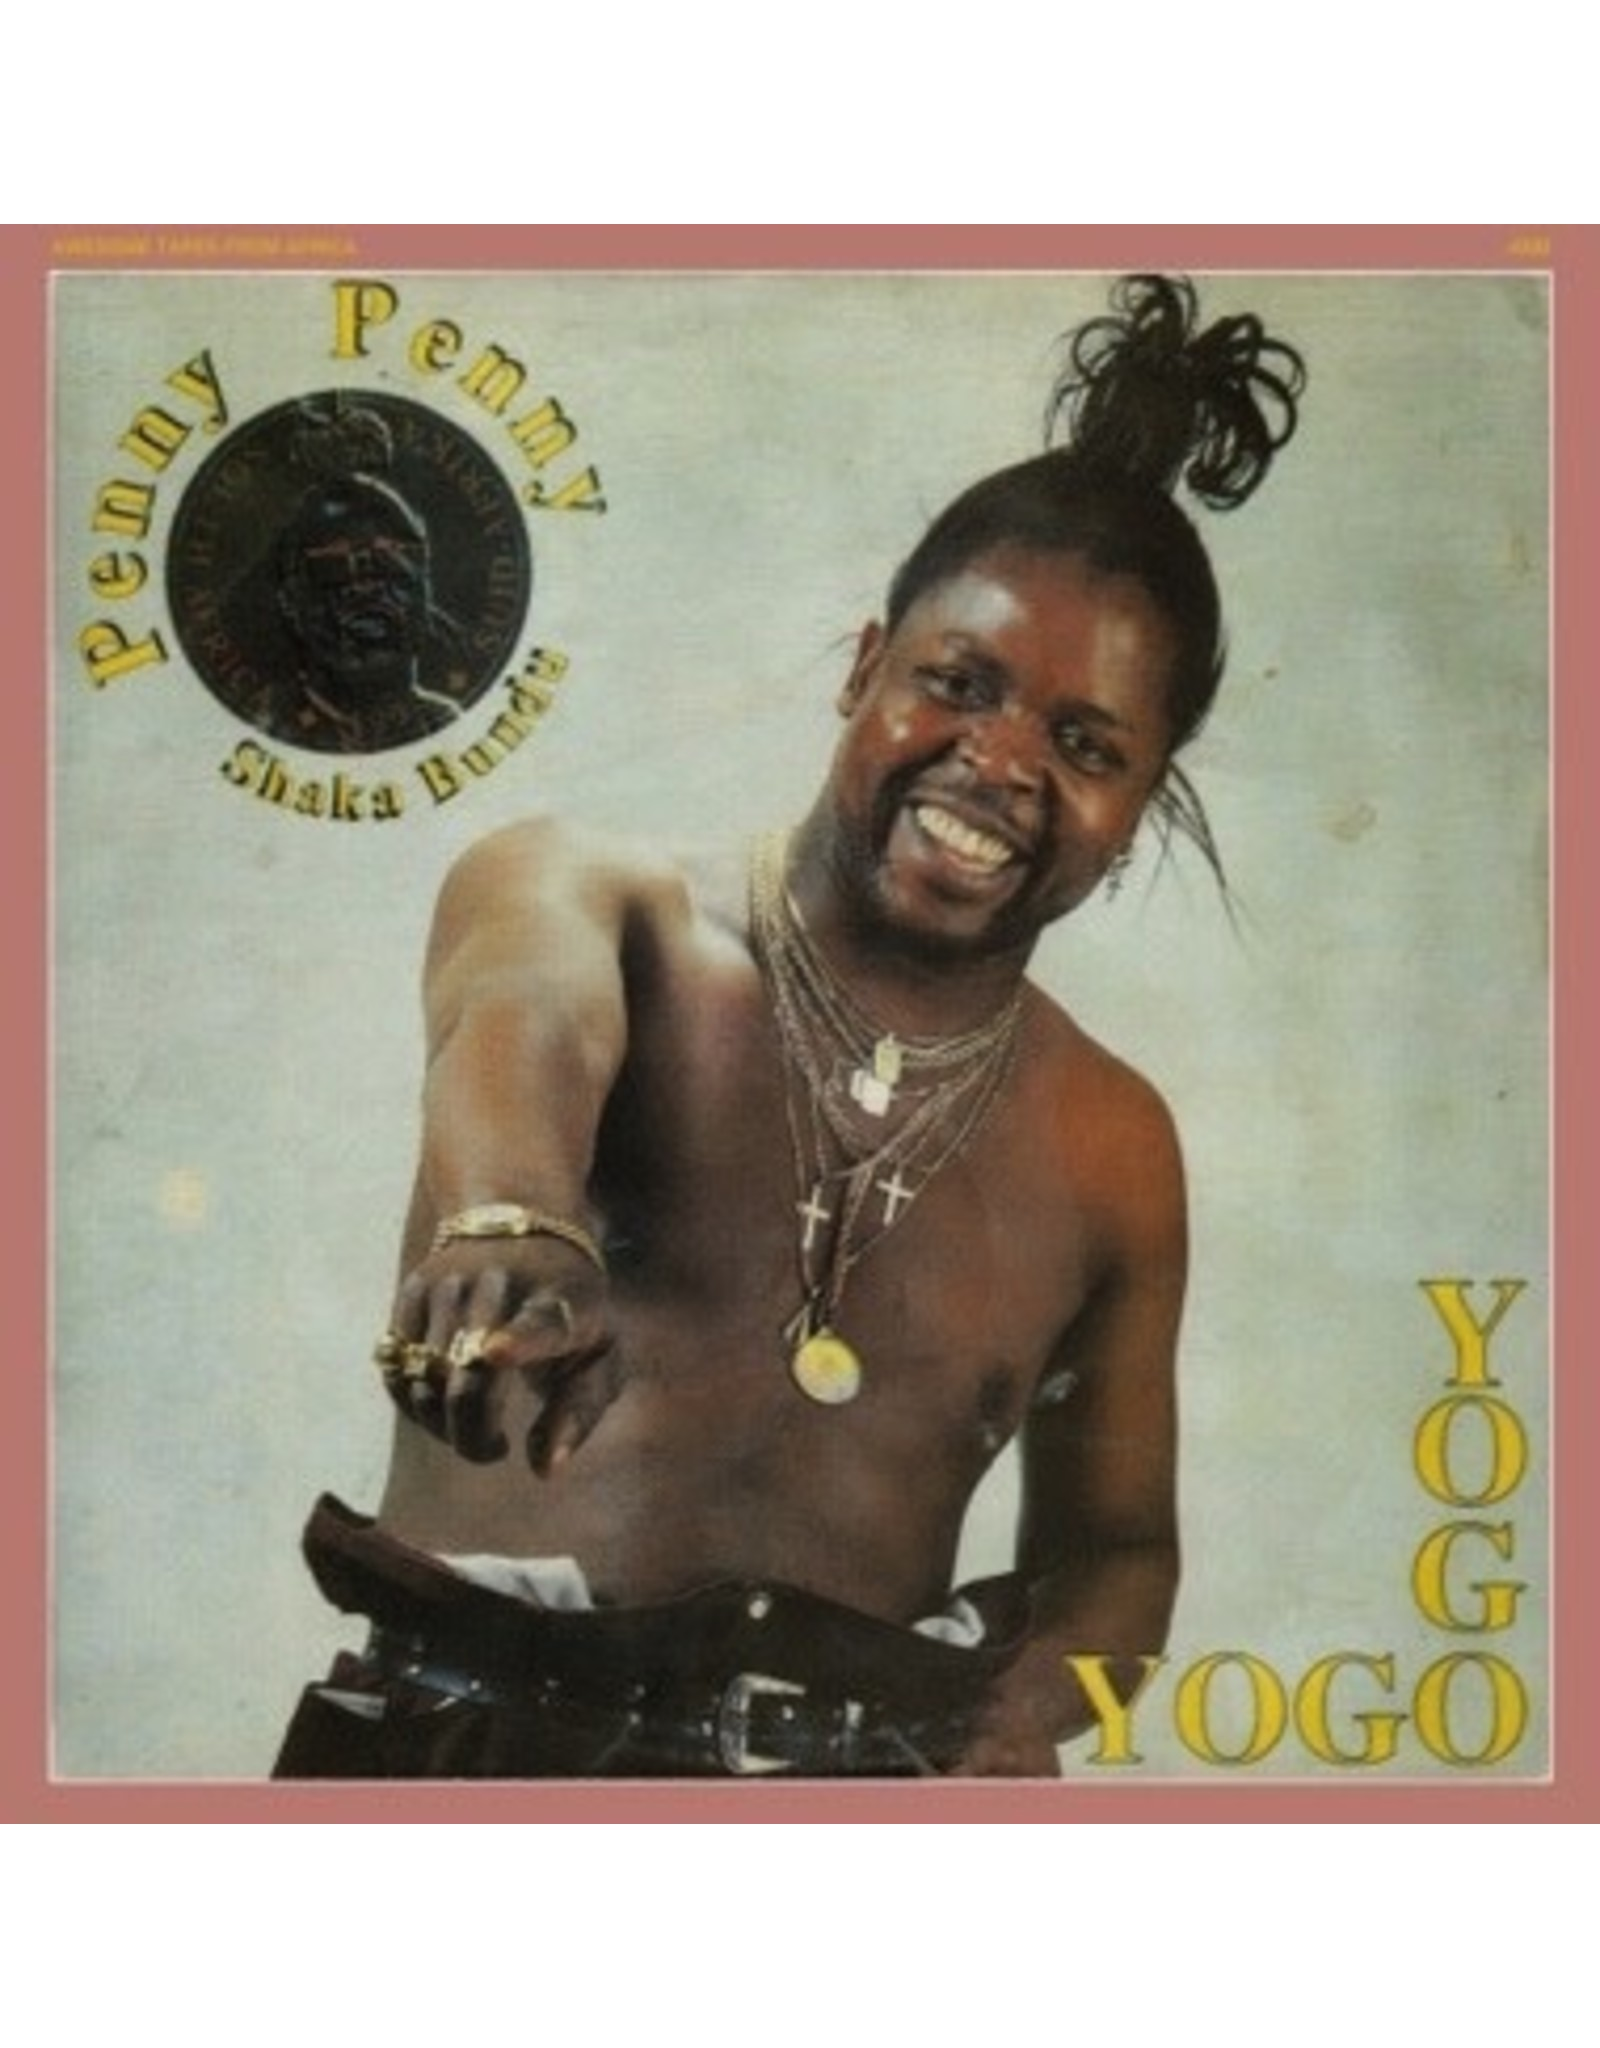 New Vinyl Penny Penny - Yogo Yogo LP